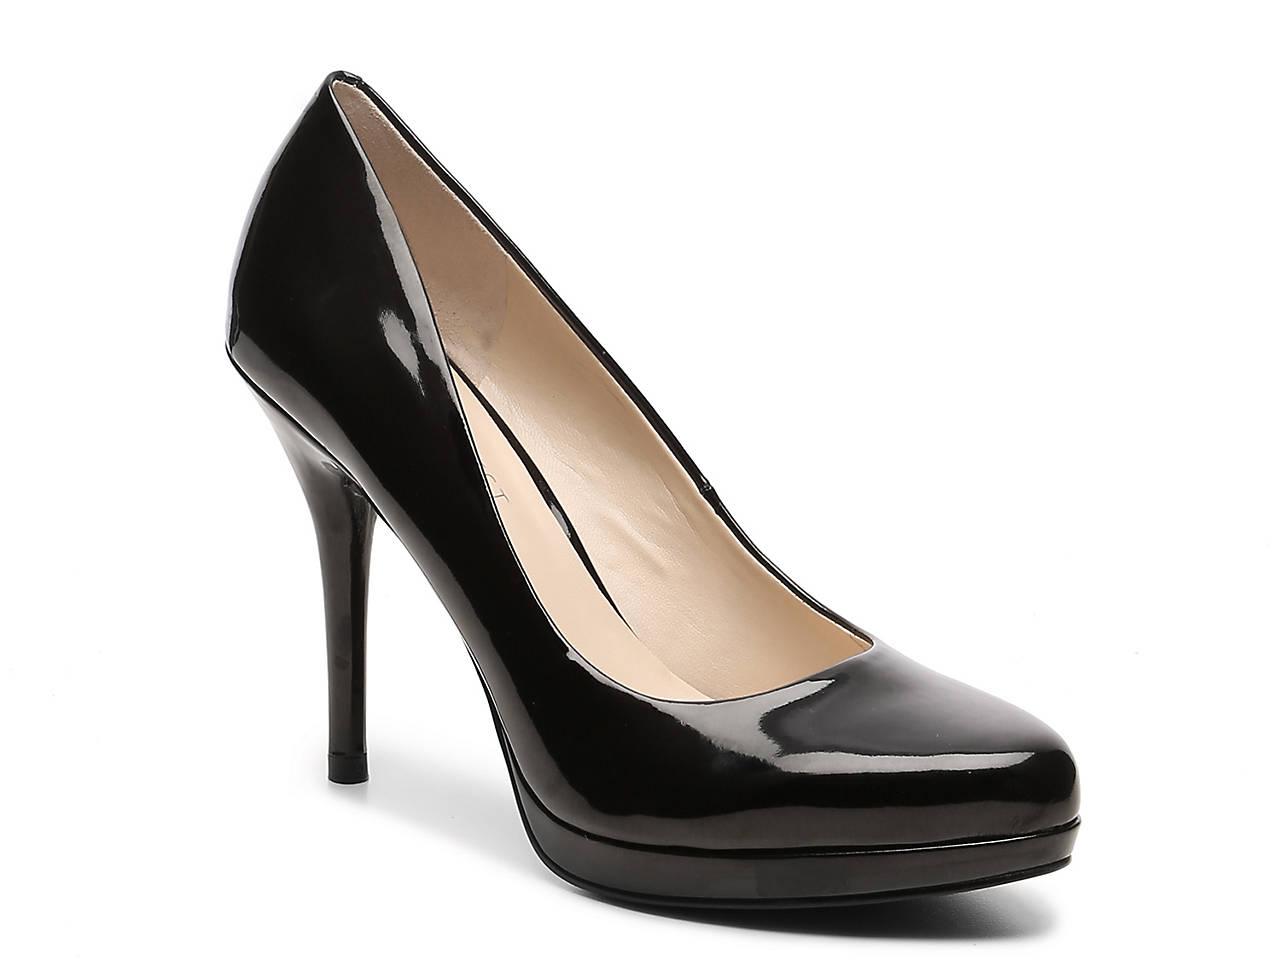 eeb2cd2b3e4 Nine West Kristal Platform Pump Women s Shoes